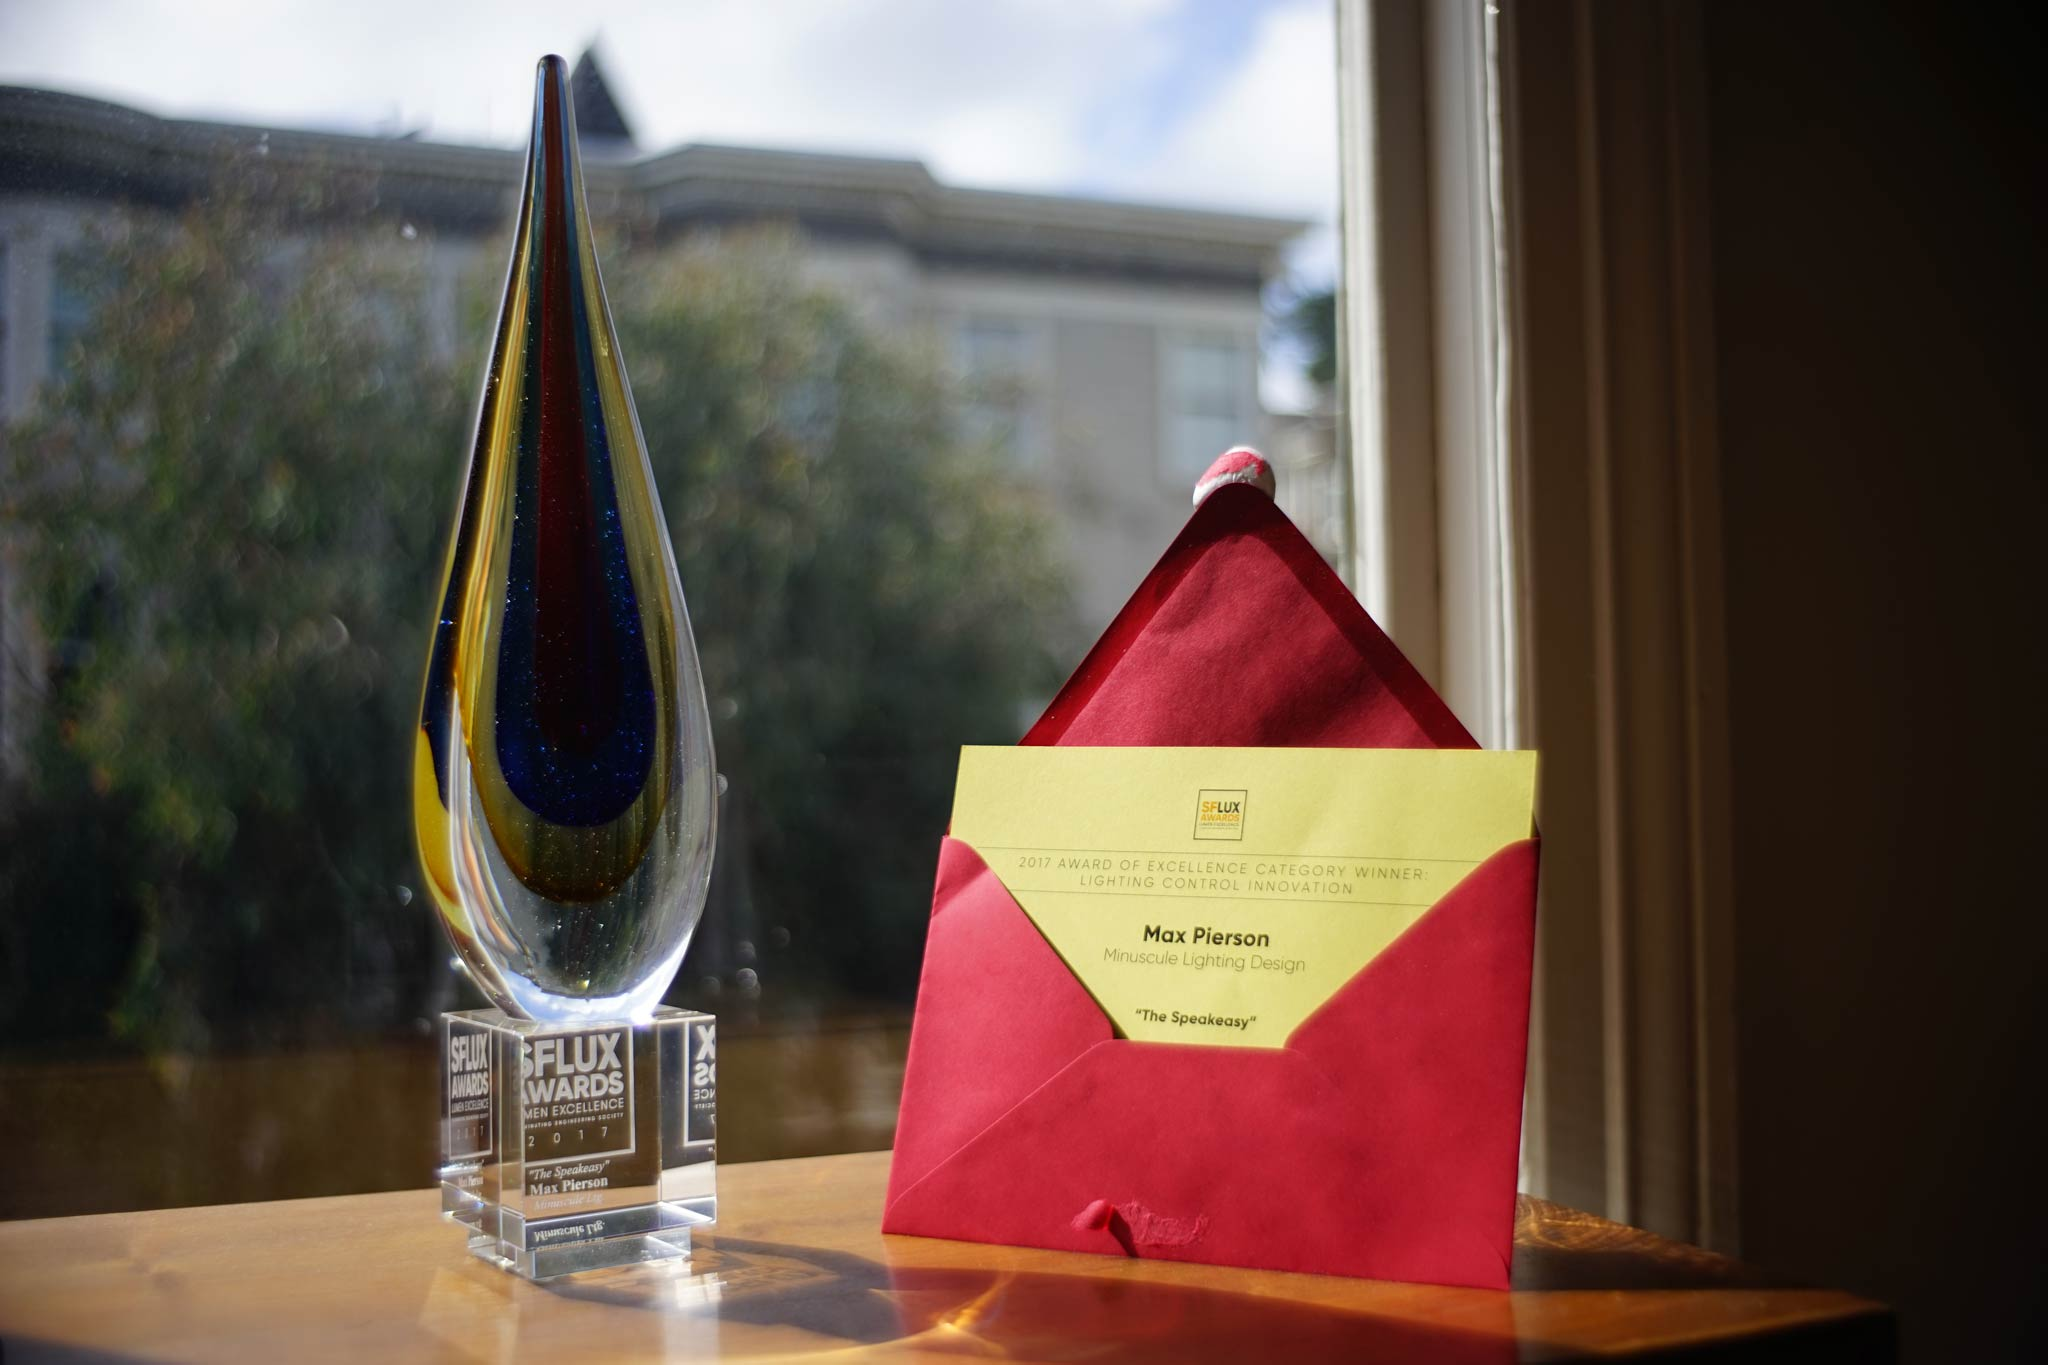 SF 2017 Lux Award of Distinction